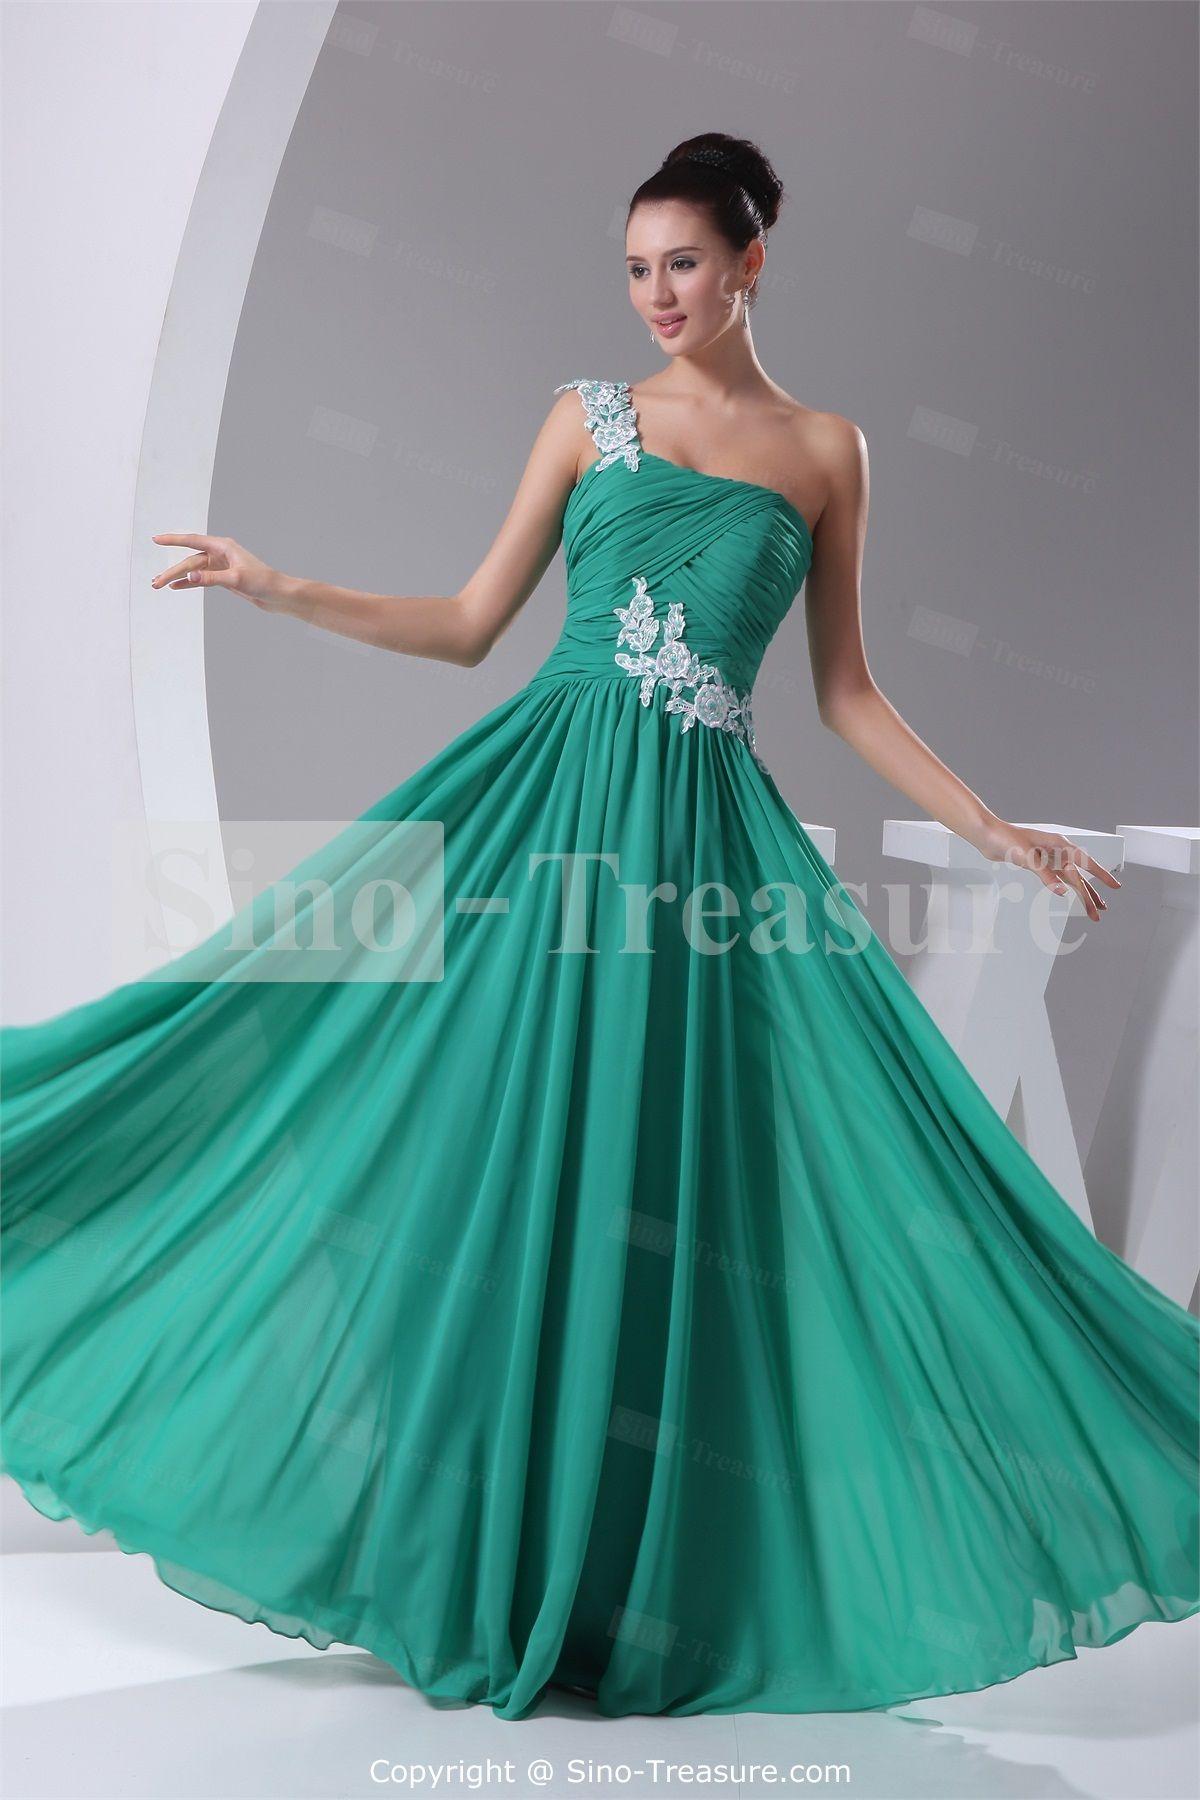 Dark Green Chiffon One Shoulder Sleeveless Prom Dress/Evening Dress ...